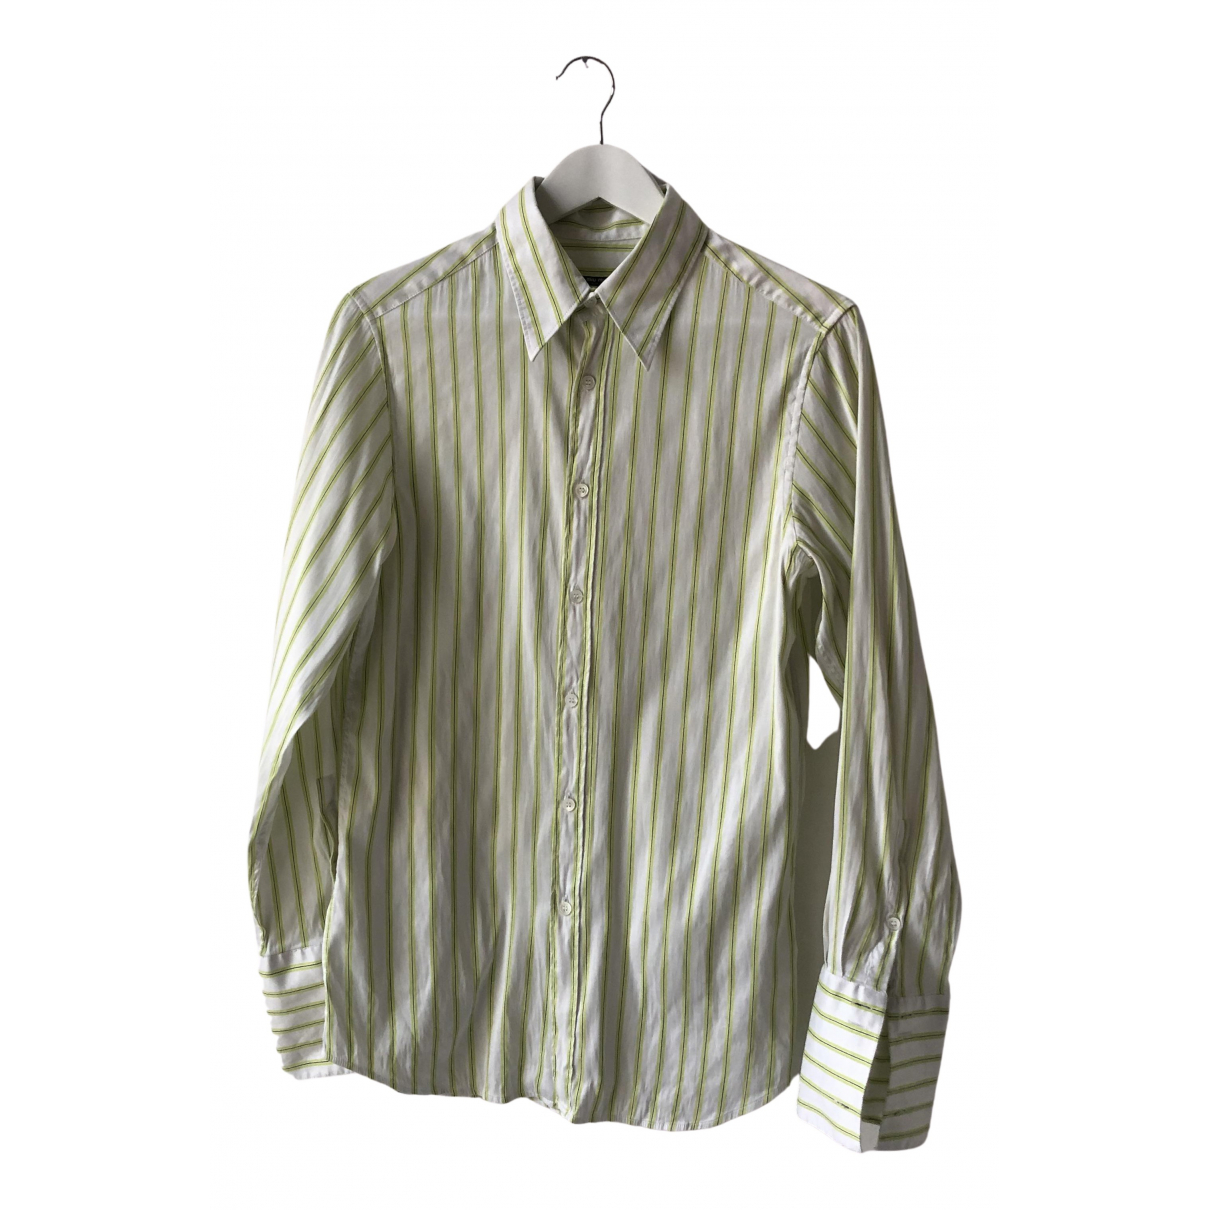 Miu Miu \N Hemden in  Gruen Baumwolle